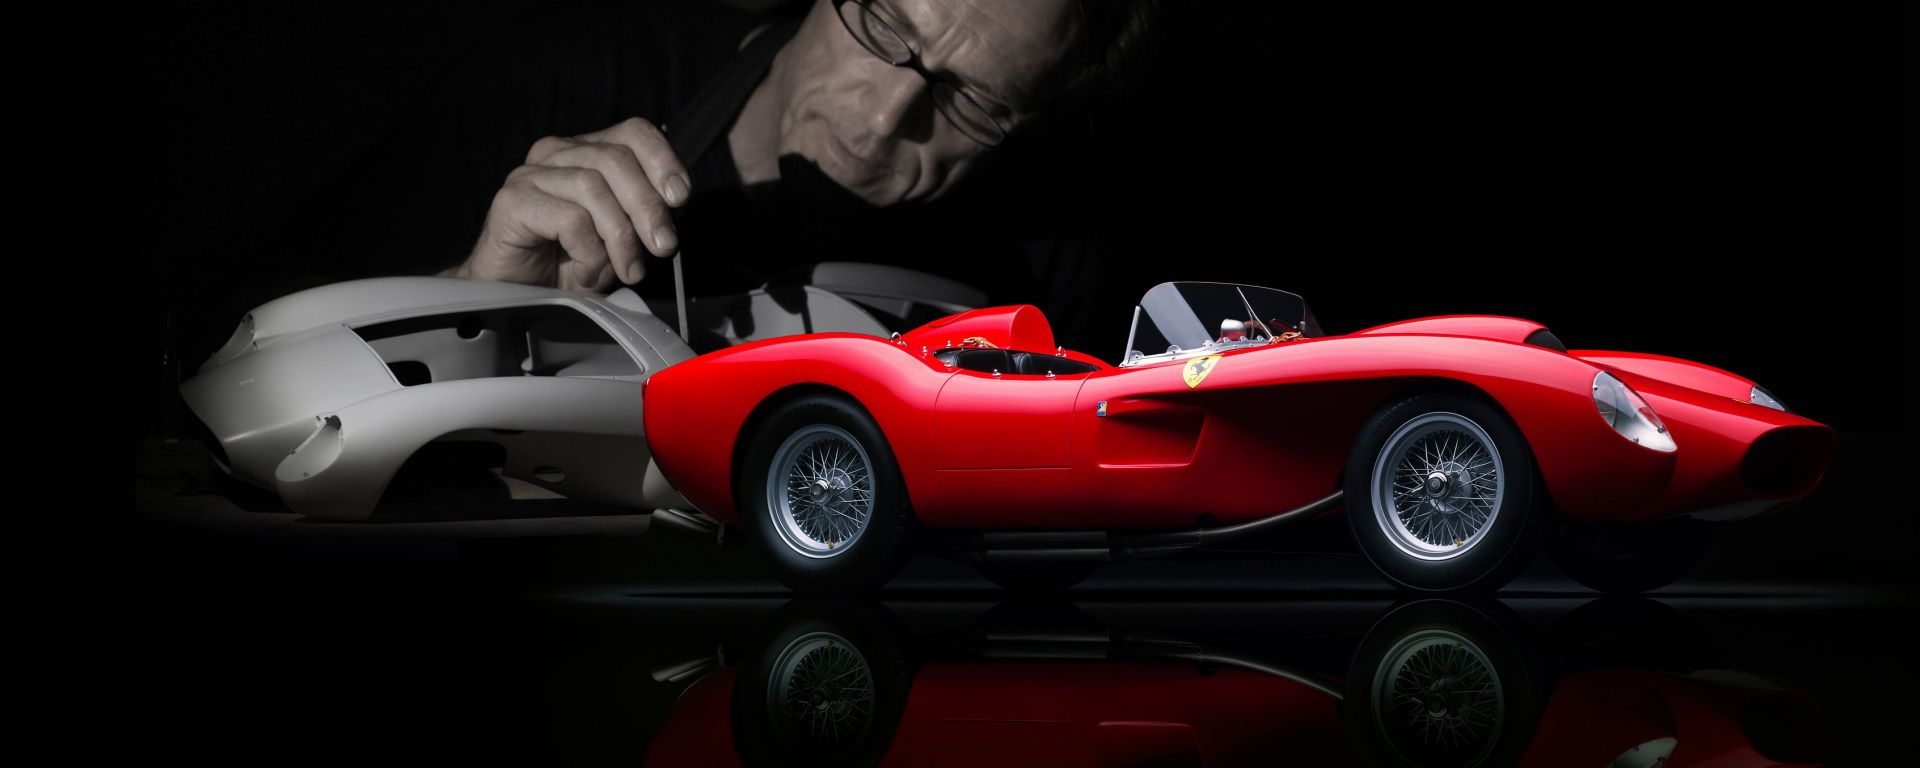 Costruzione di Ferrari F250 TR